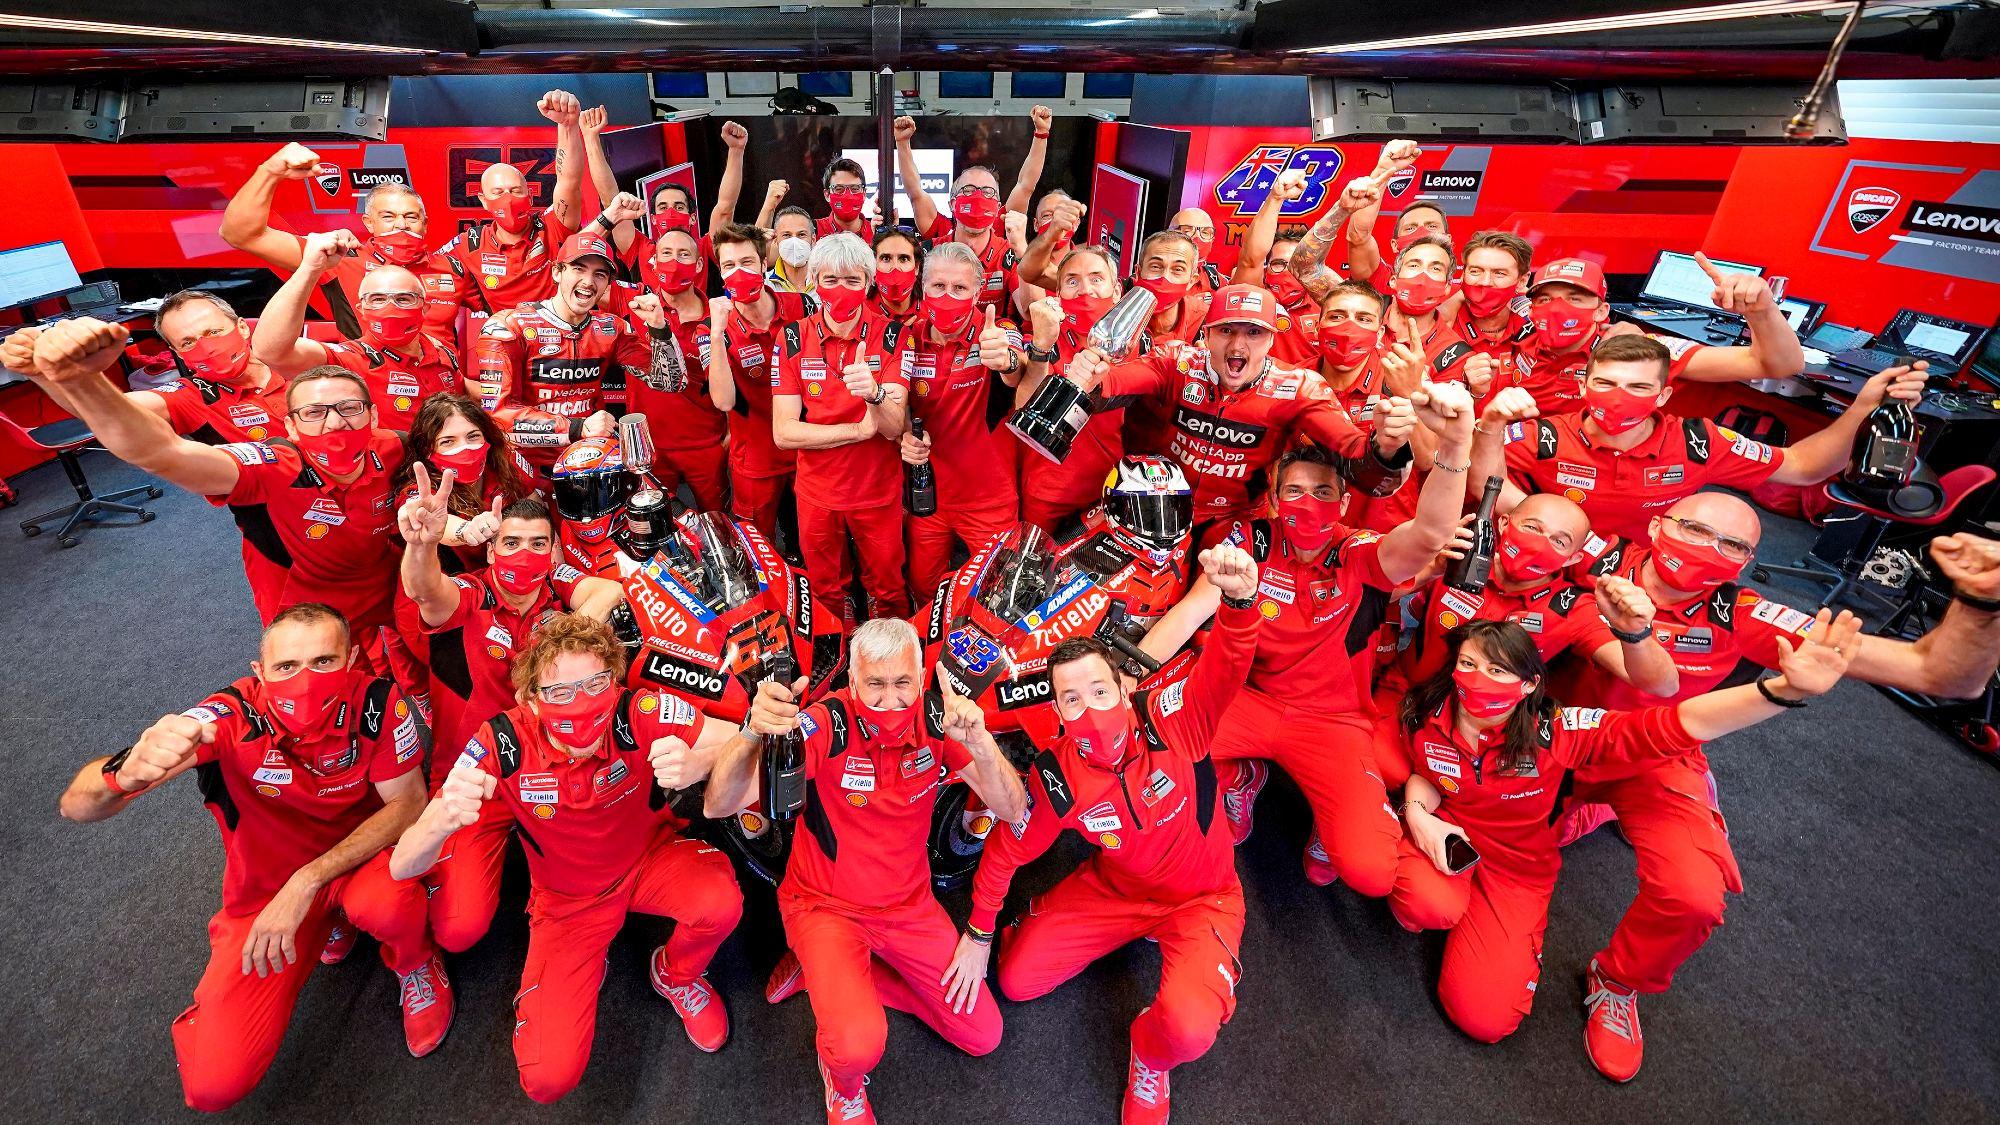 Ducati Corsa, MotoGP 2021 GP da Espanha